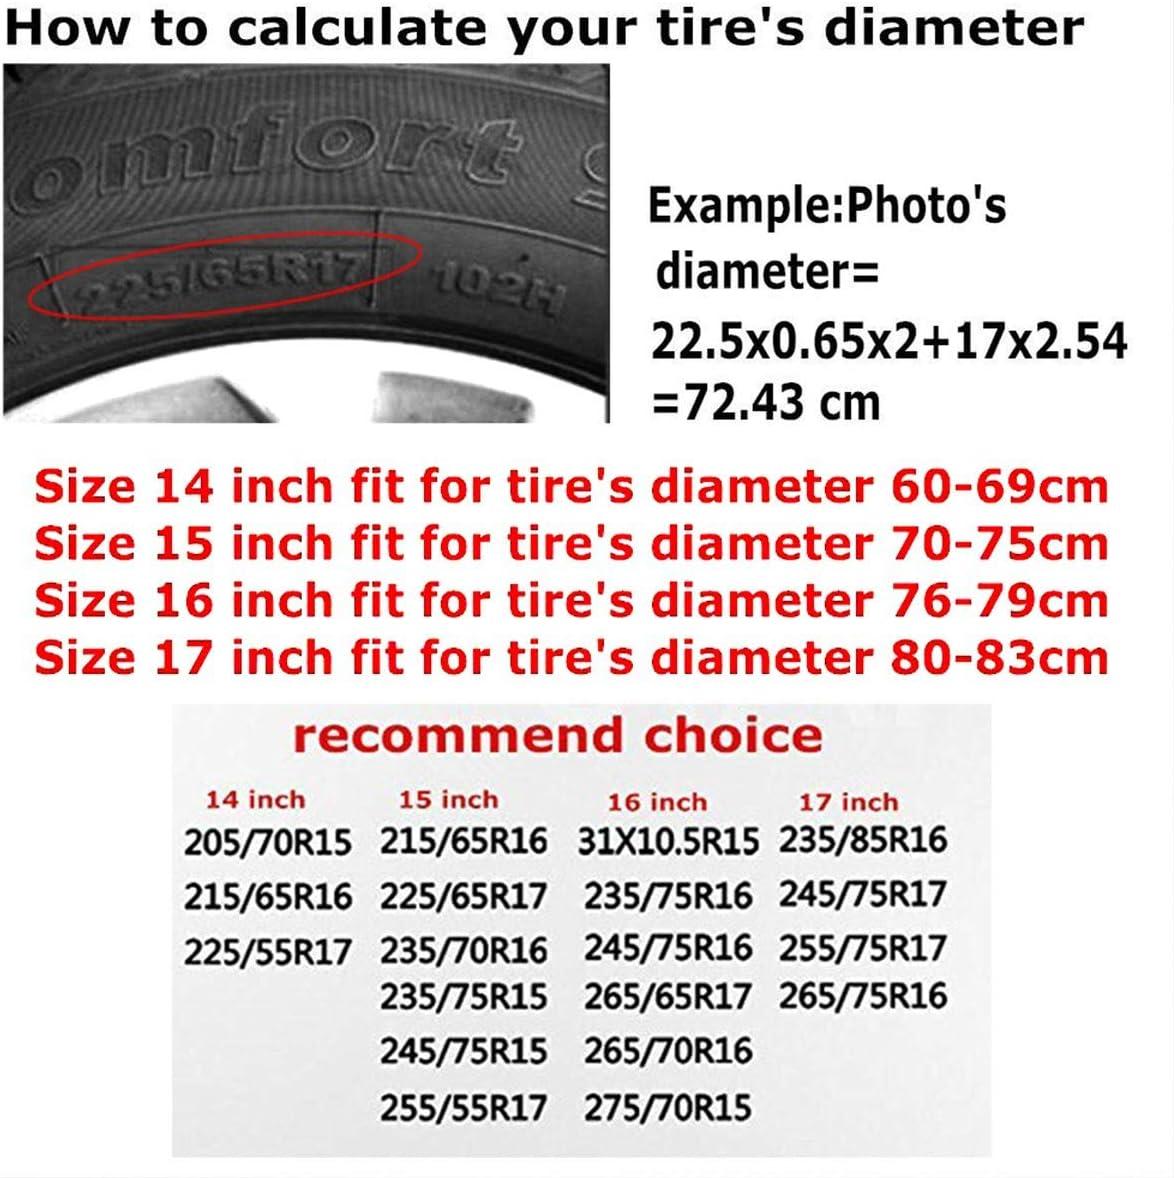 Ouqiuwa Spare Tire Cover Camping Happy Camper Universal Wheel Covers for Jeep Trailer RV SUV 17 Inch for Diameter 31-33 Inch